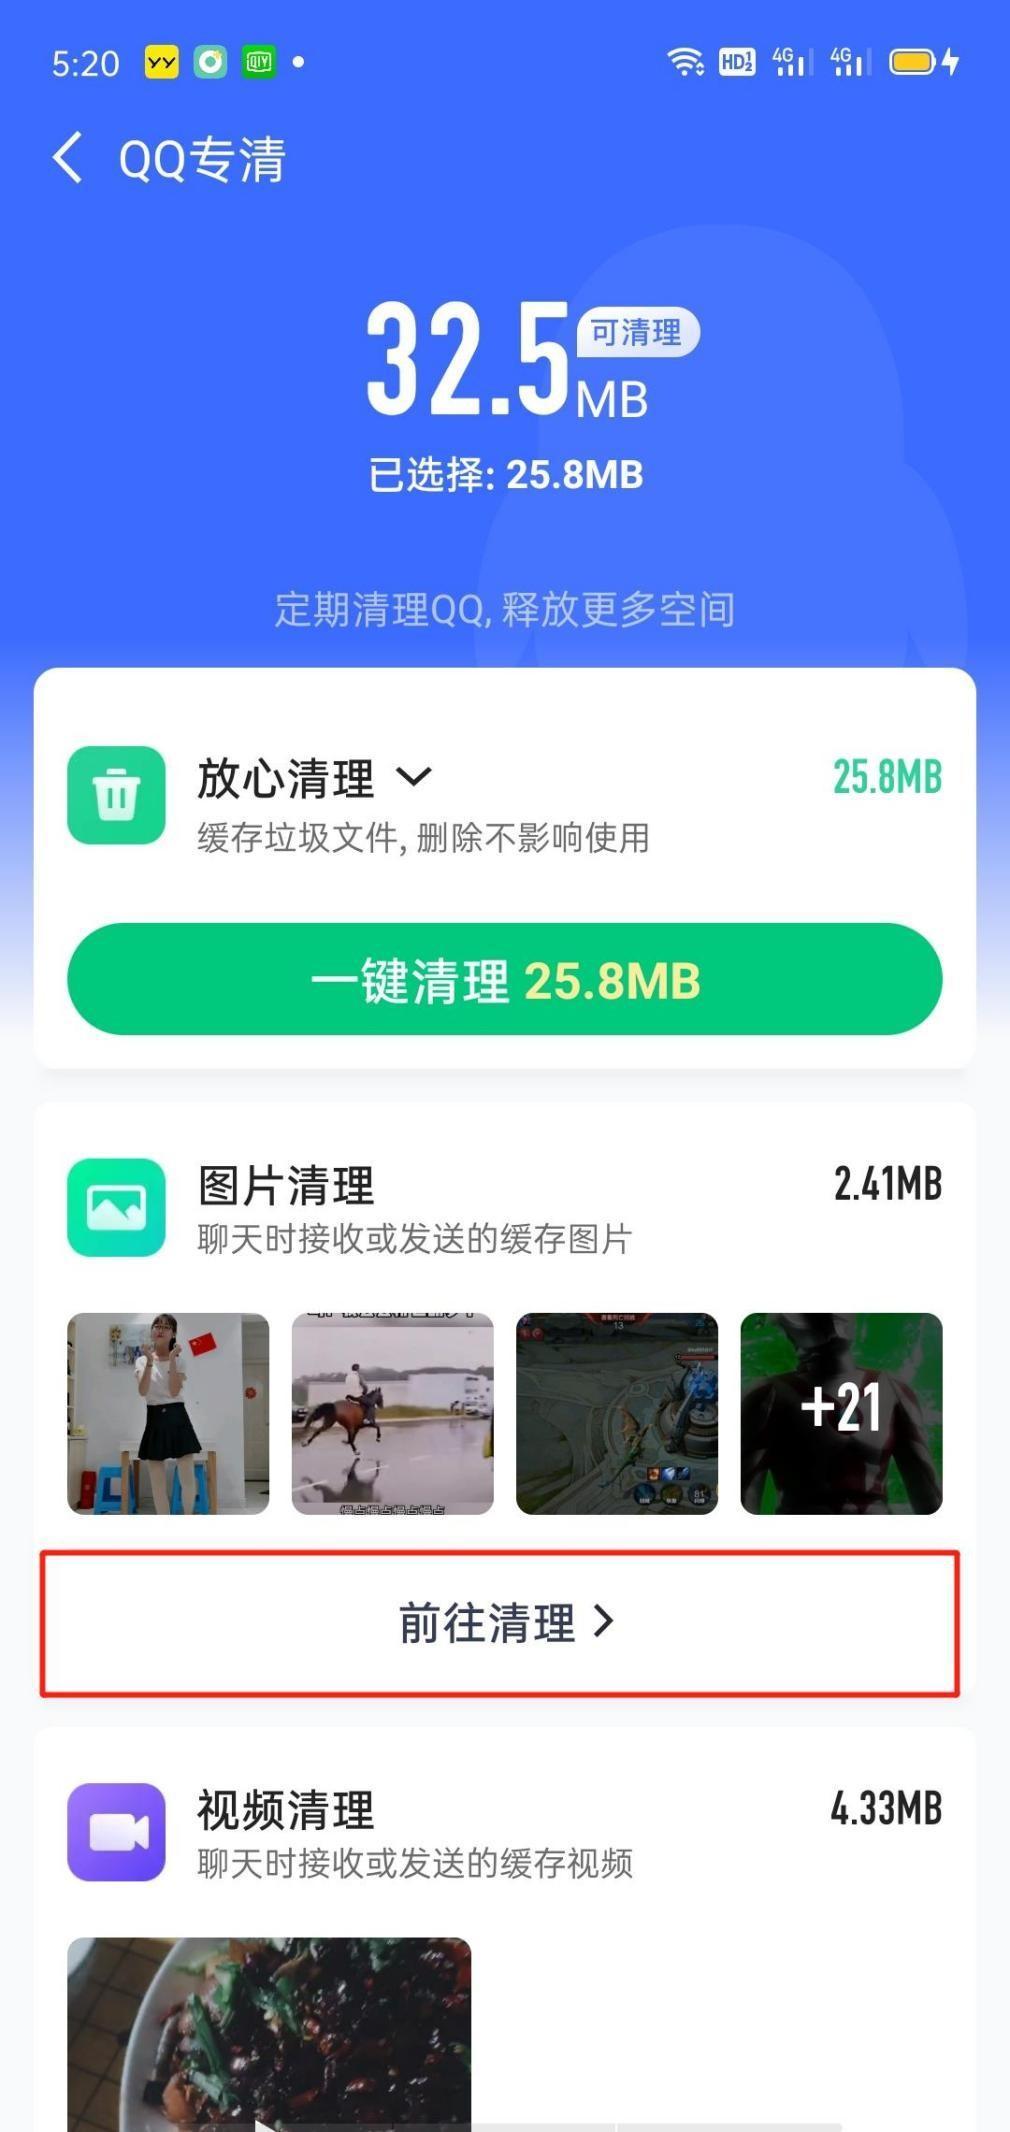 APUS阿帕斯清理大师教程之手机QQ清理功能介绍【图文详解】